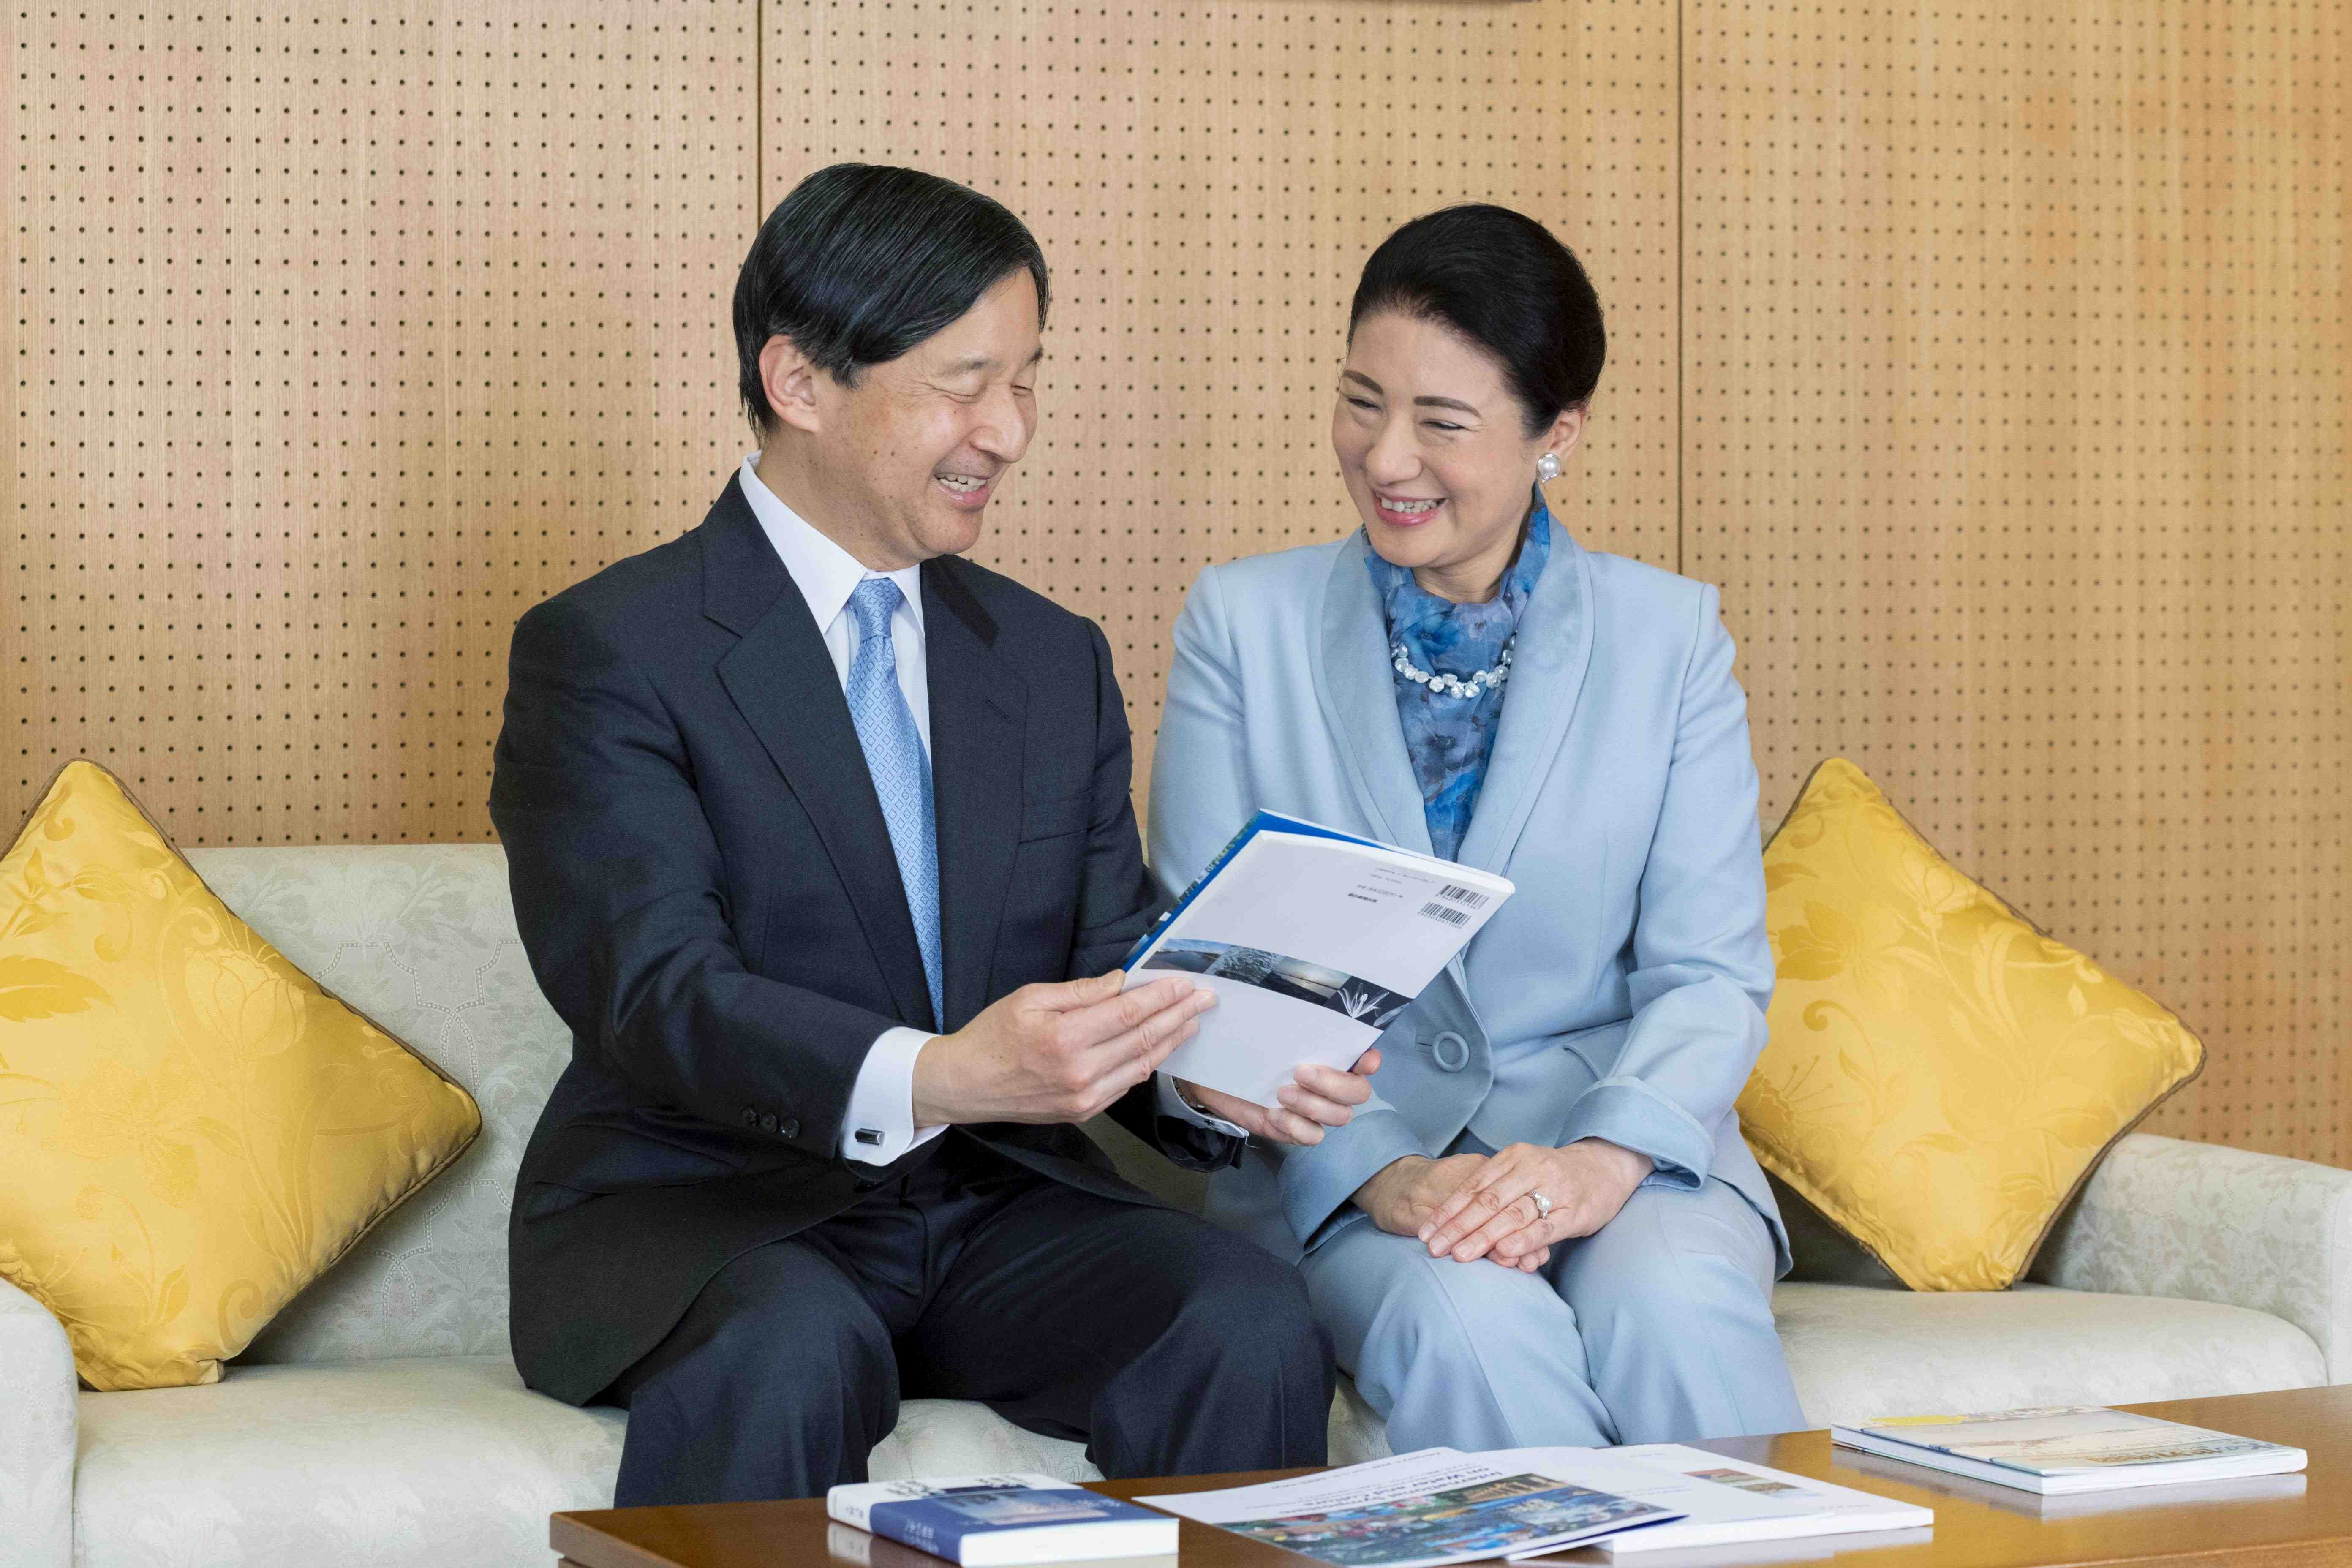 Japan Emperor and Empress Masako